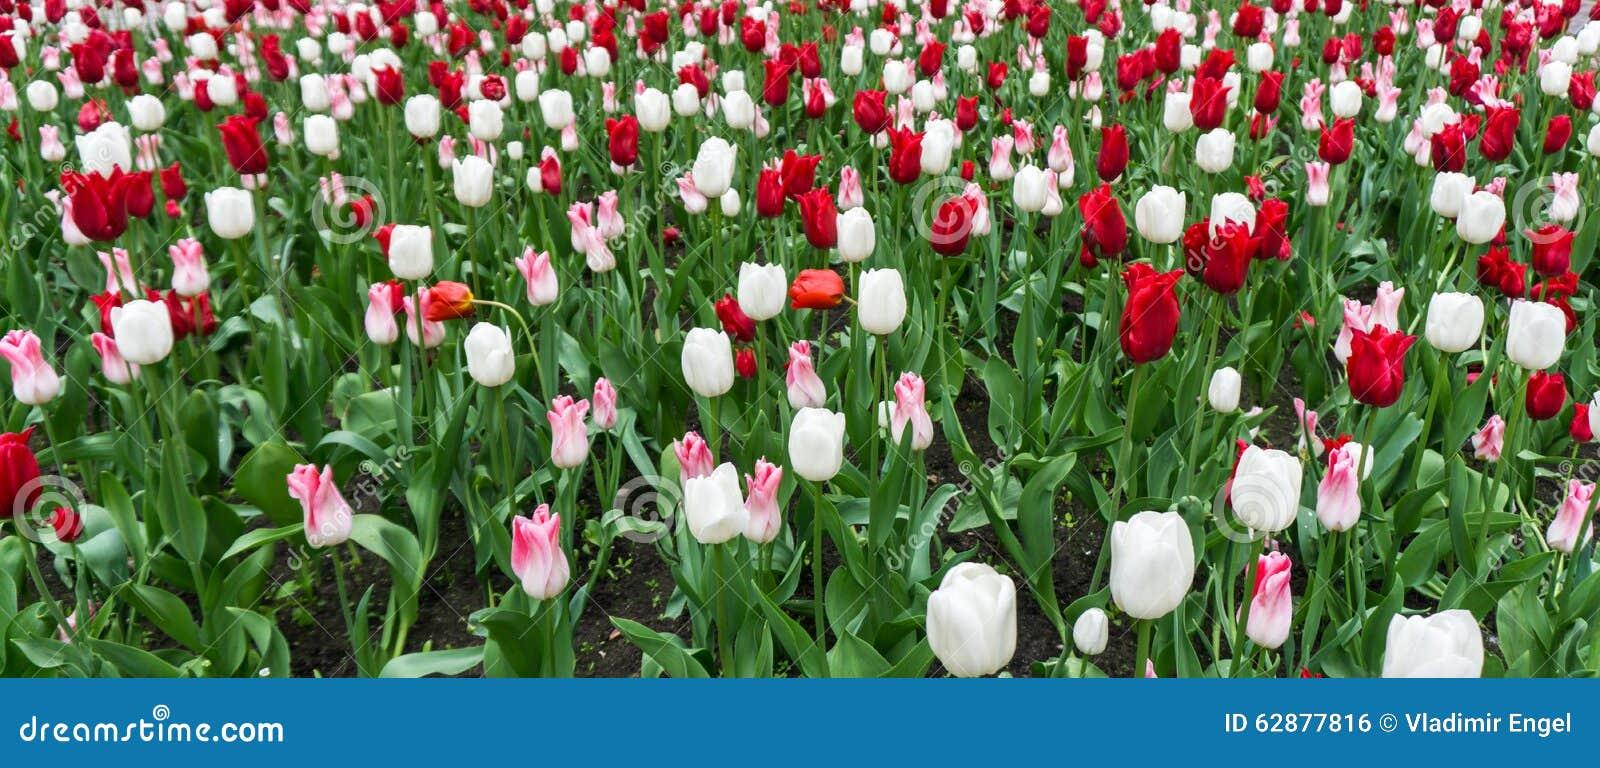 Colourful tulips flowers season garden outdoor beauty